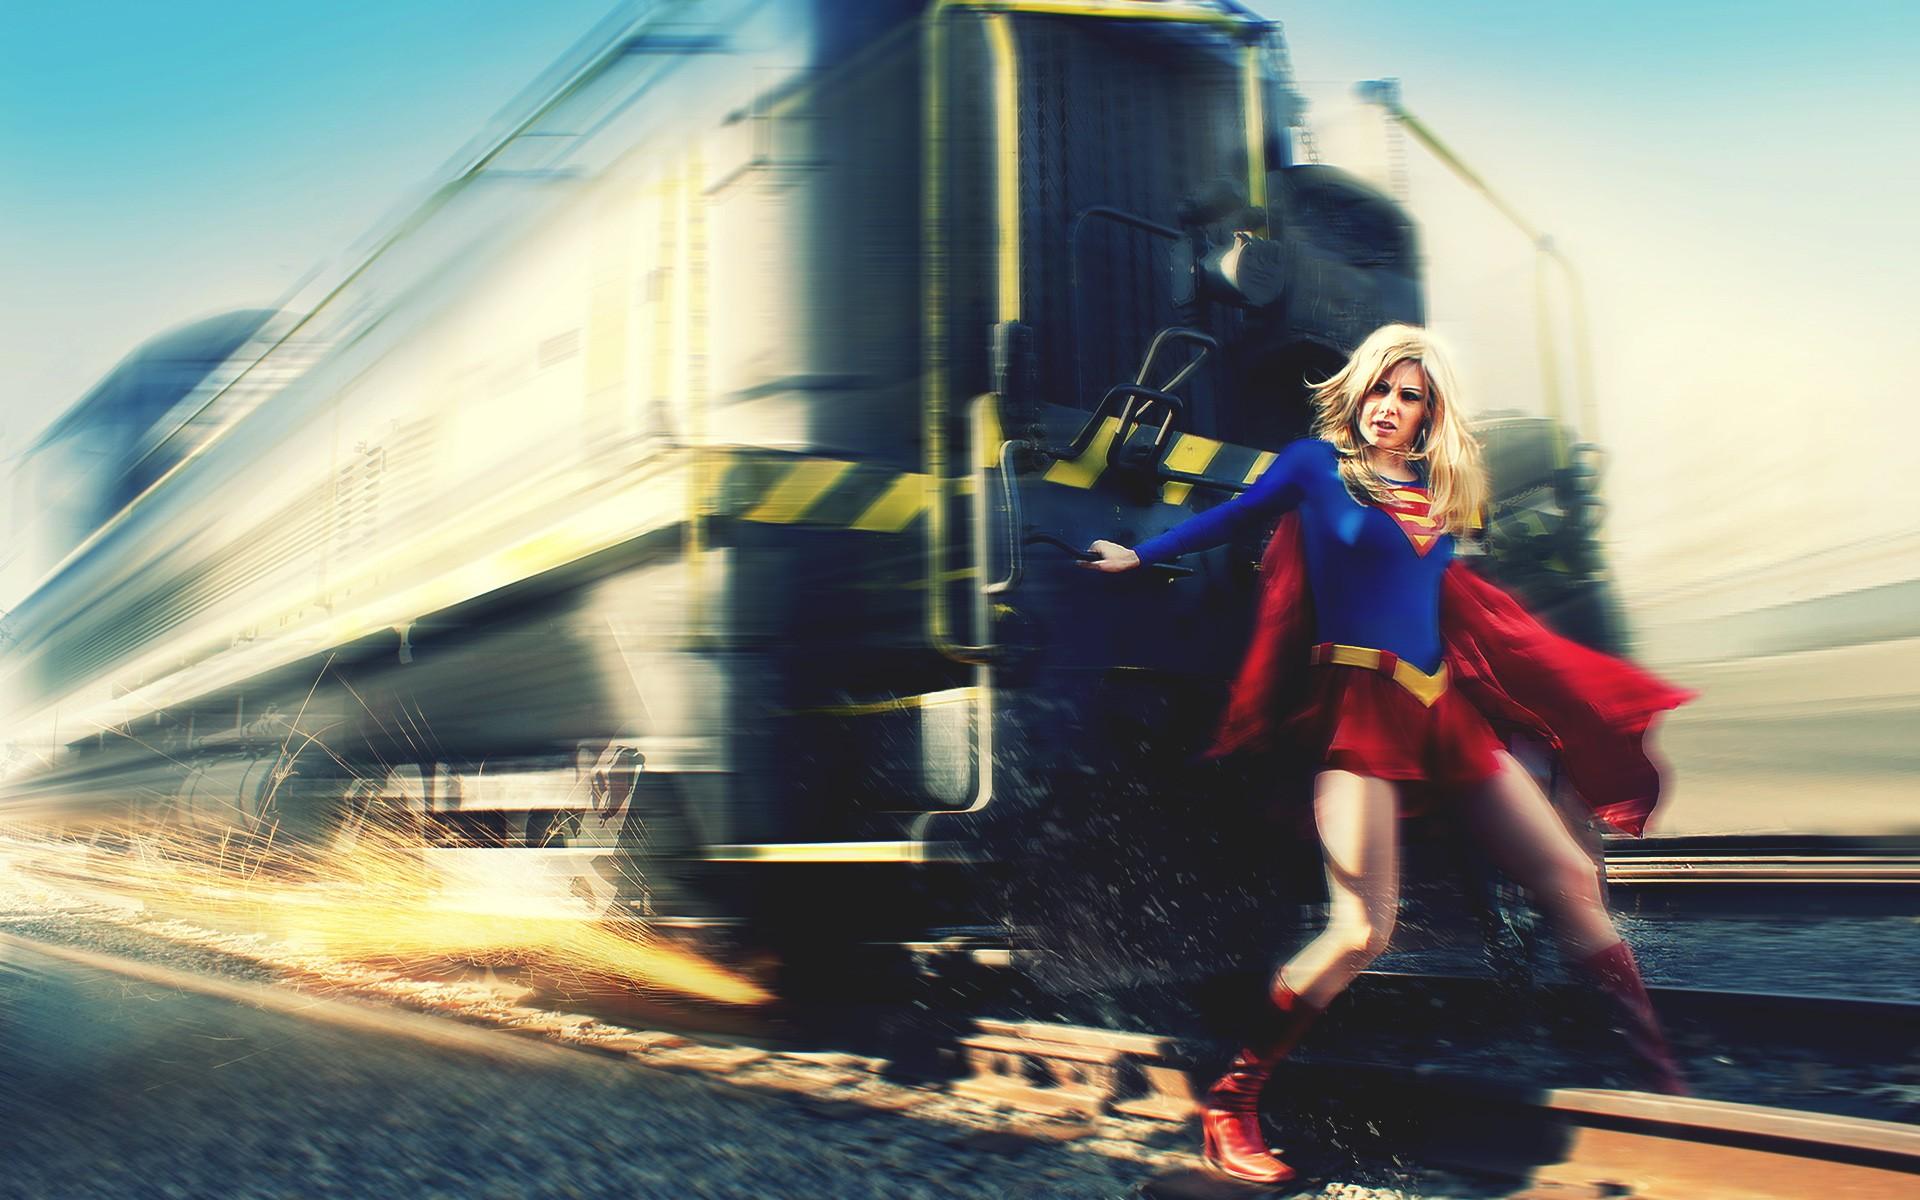 Supergirl DC Train Blonde Cosplay superhero wallpaper 1920x1200 1920x1200